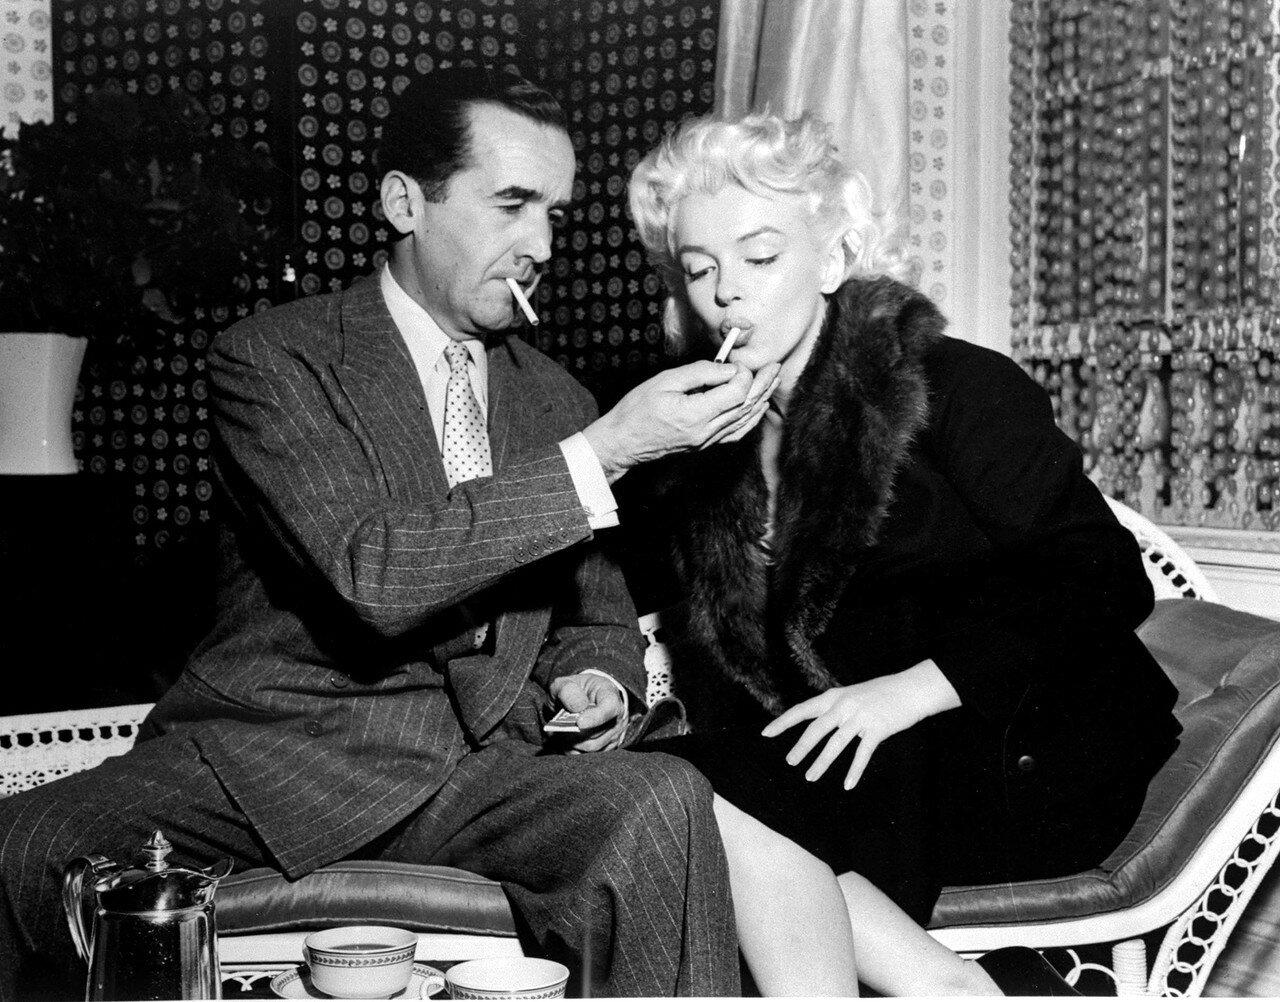 Edward R. Murrow Lights Cigarette For Marilyn Monroe